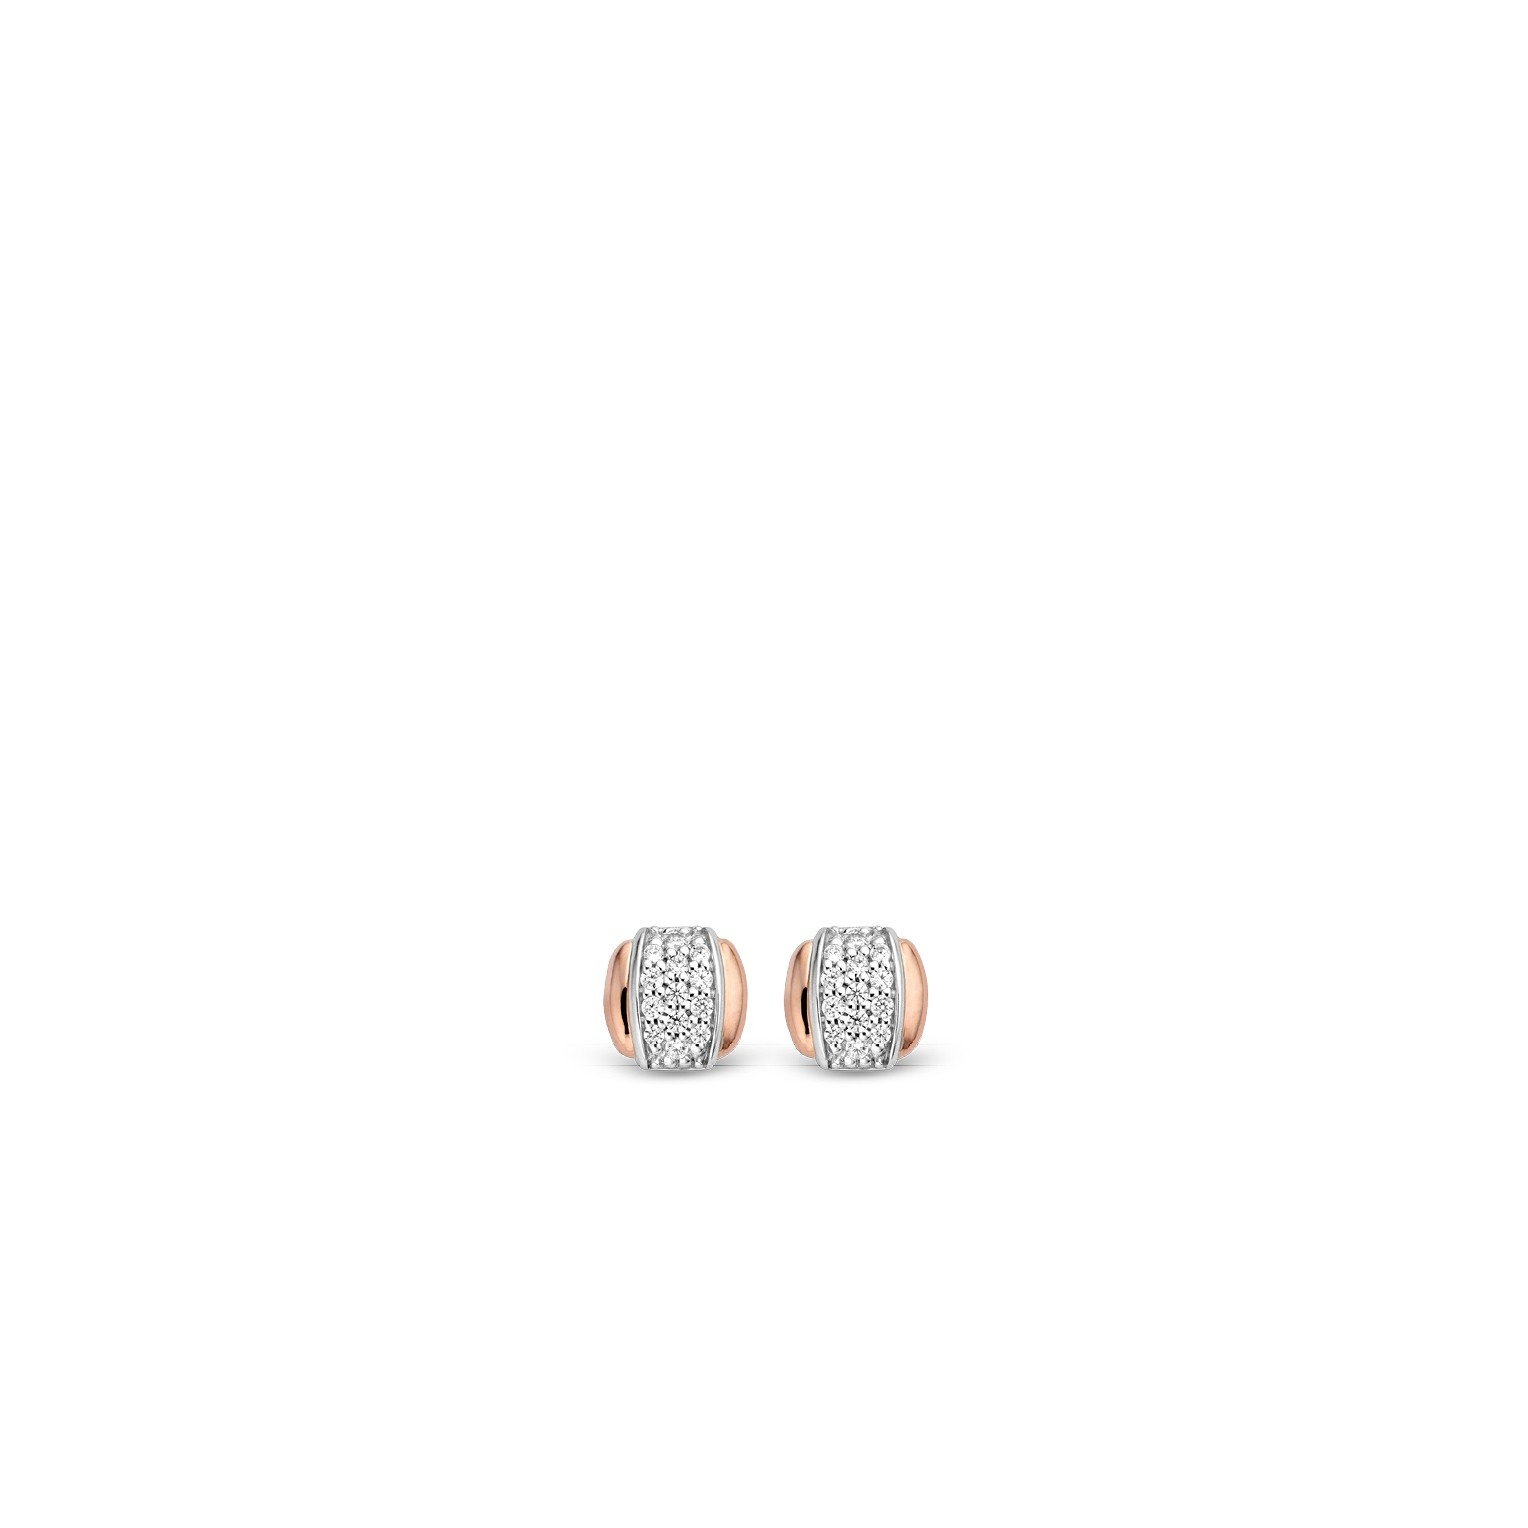 TI SENTO - Milano Earrings 7799ZR-2